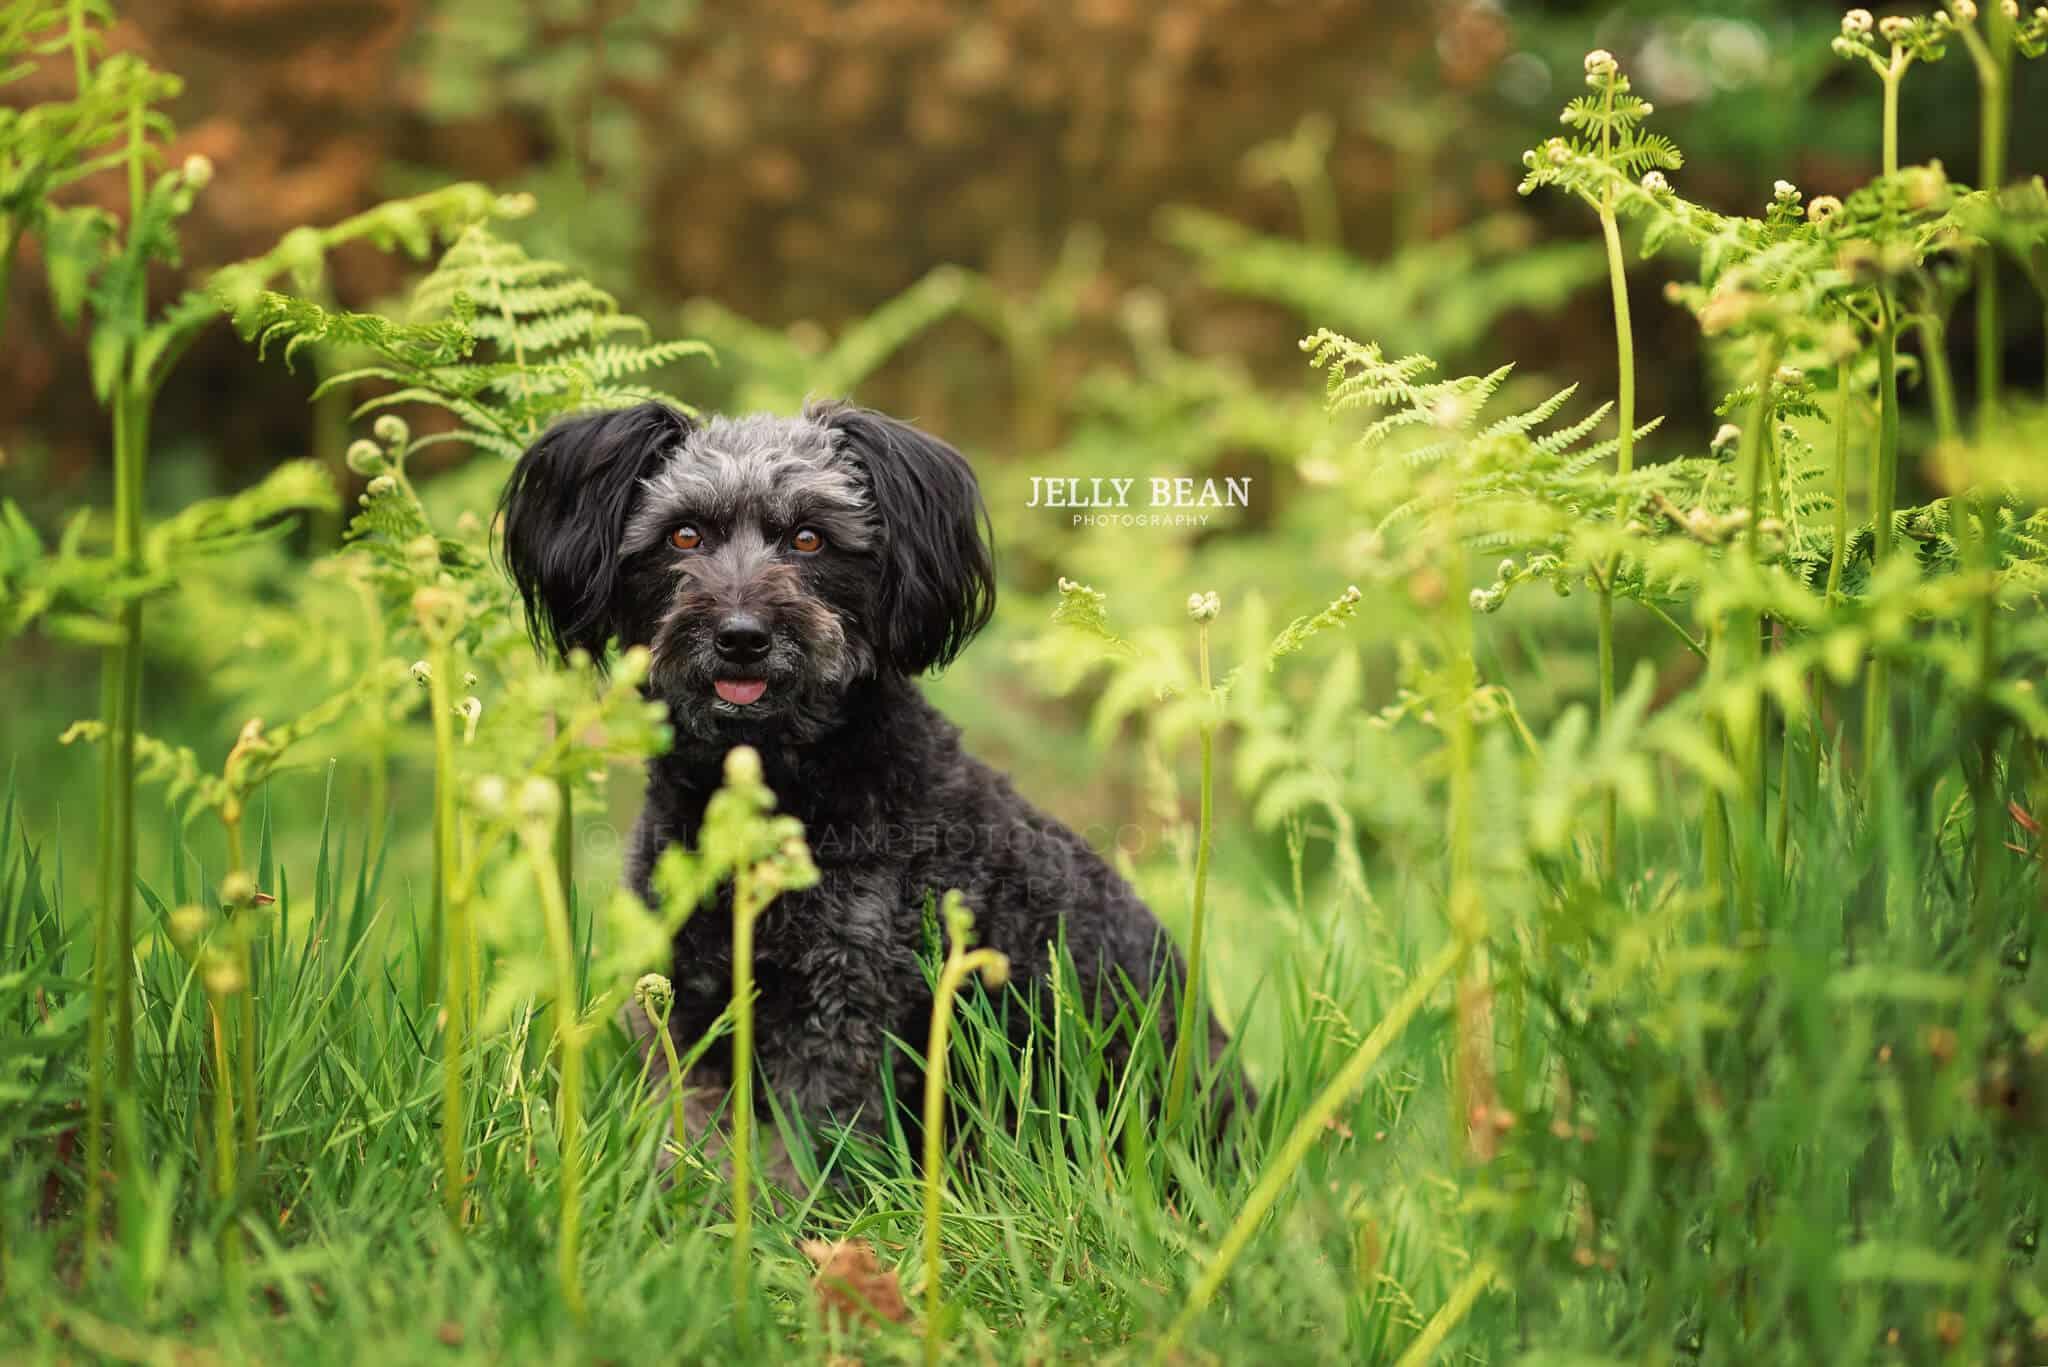 black poodle cross in ferns